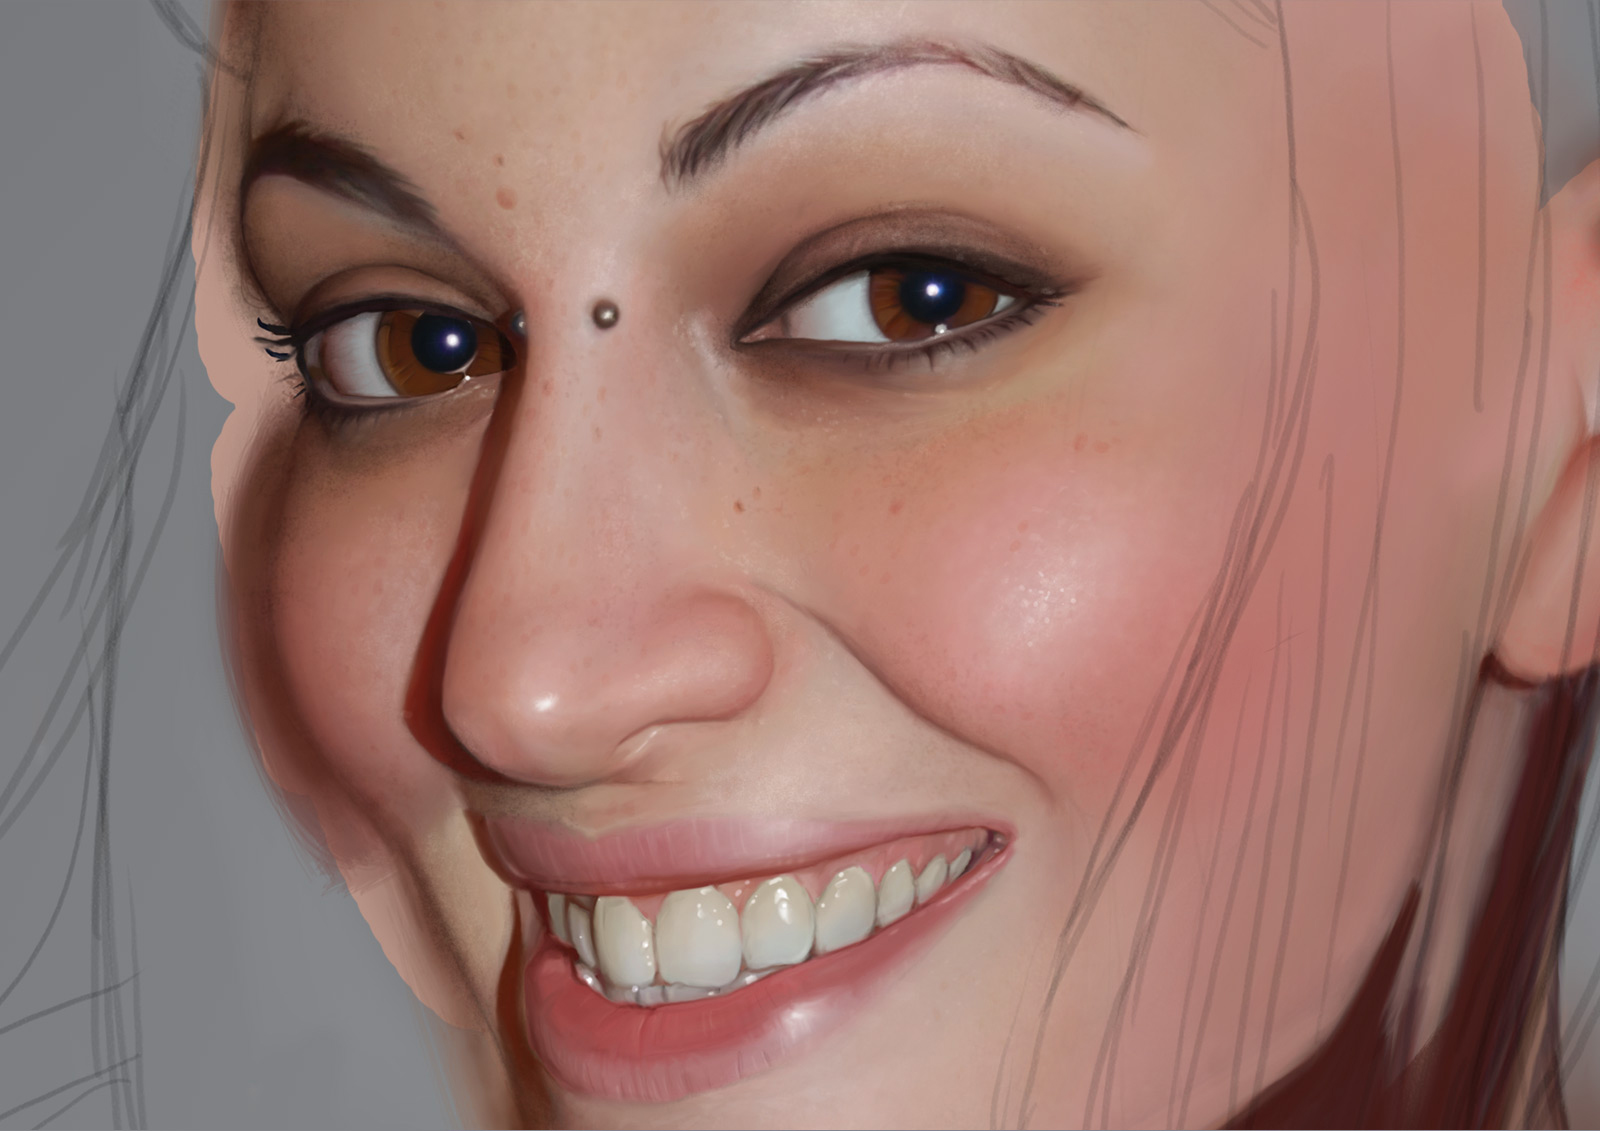 Digital Skin Create Web Sites